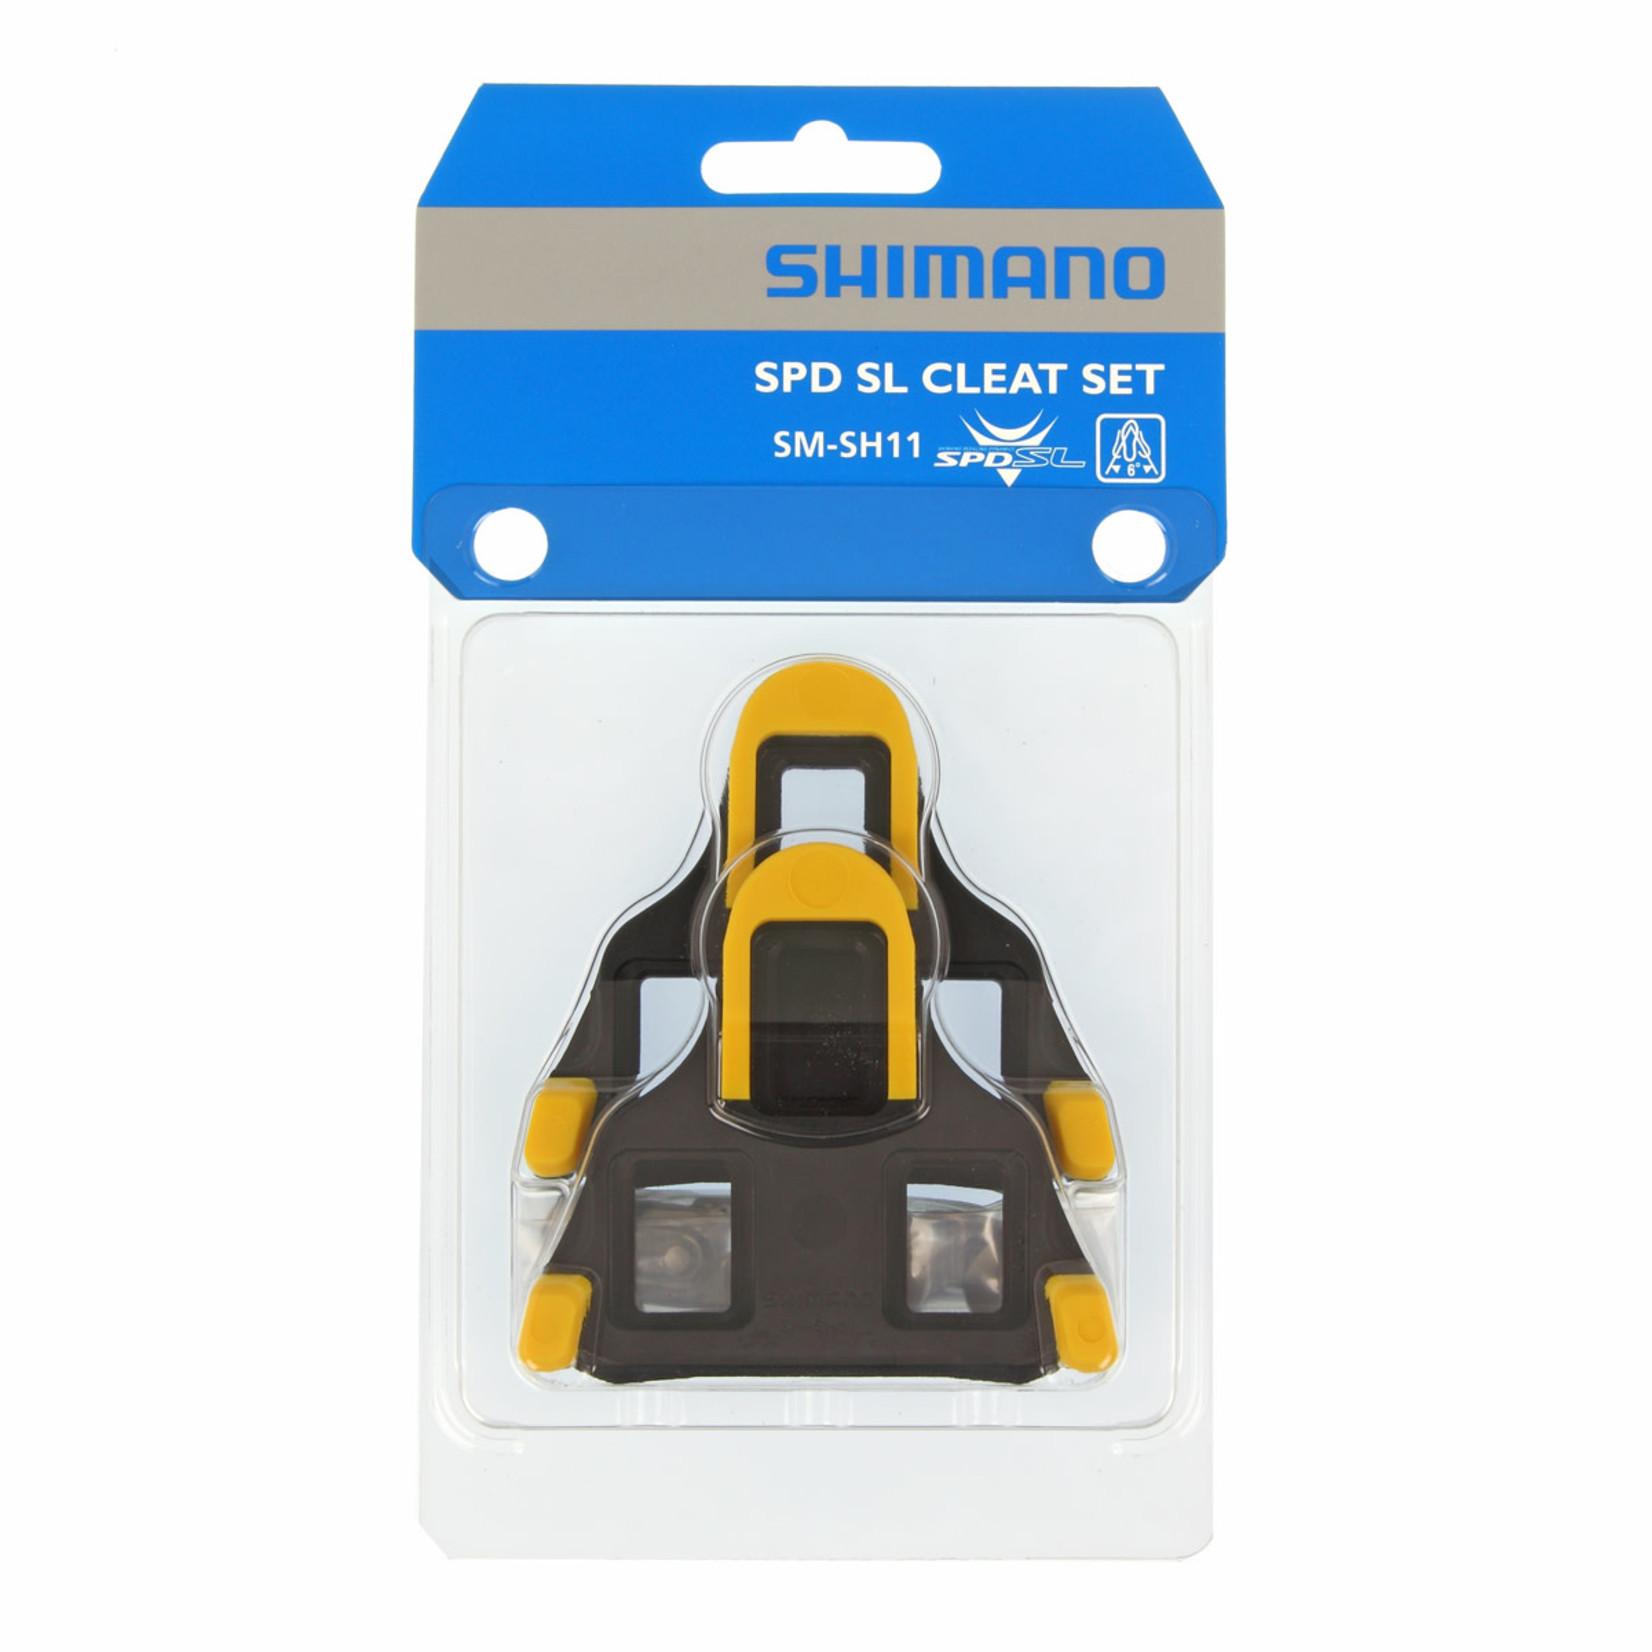 Shimano SPD-SL Cleats